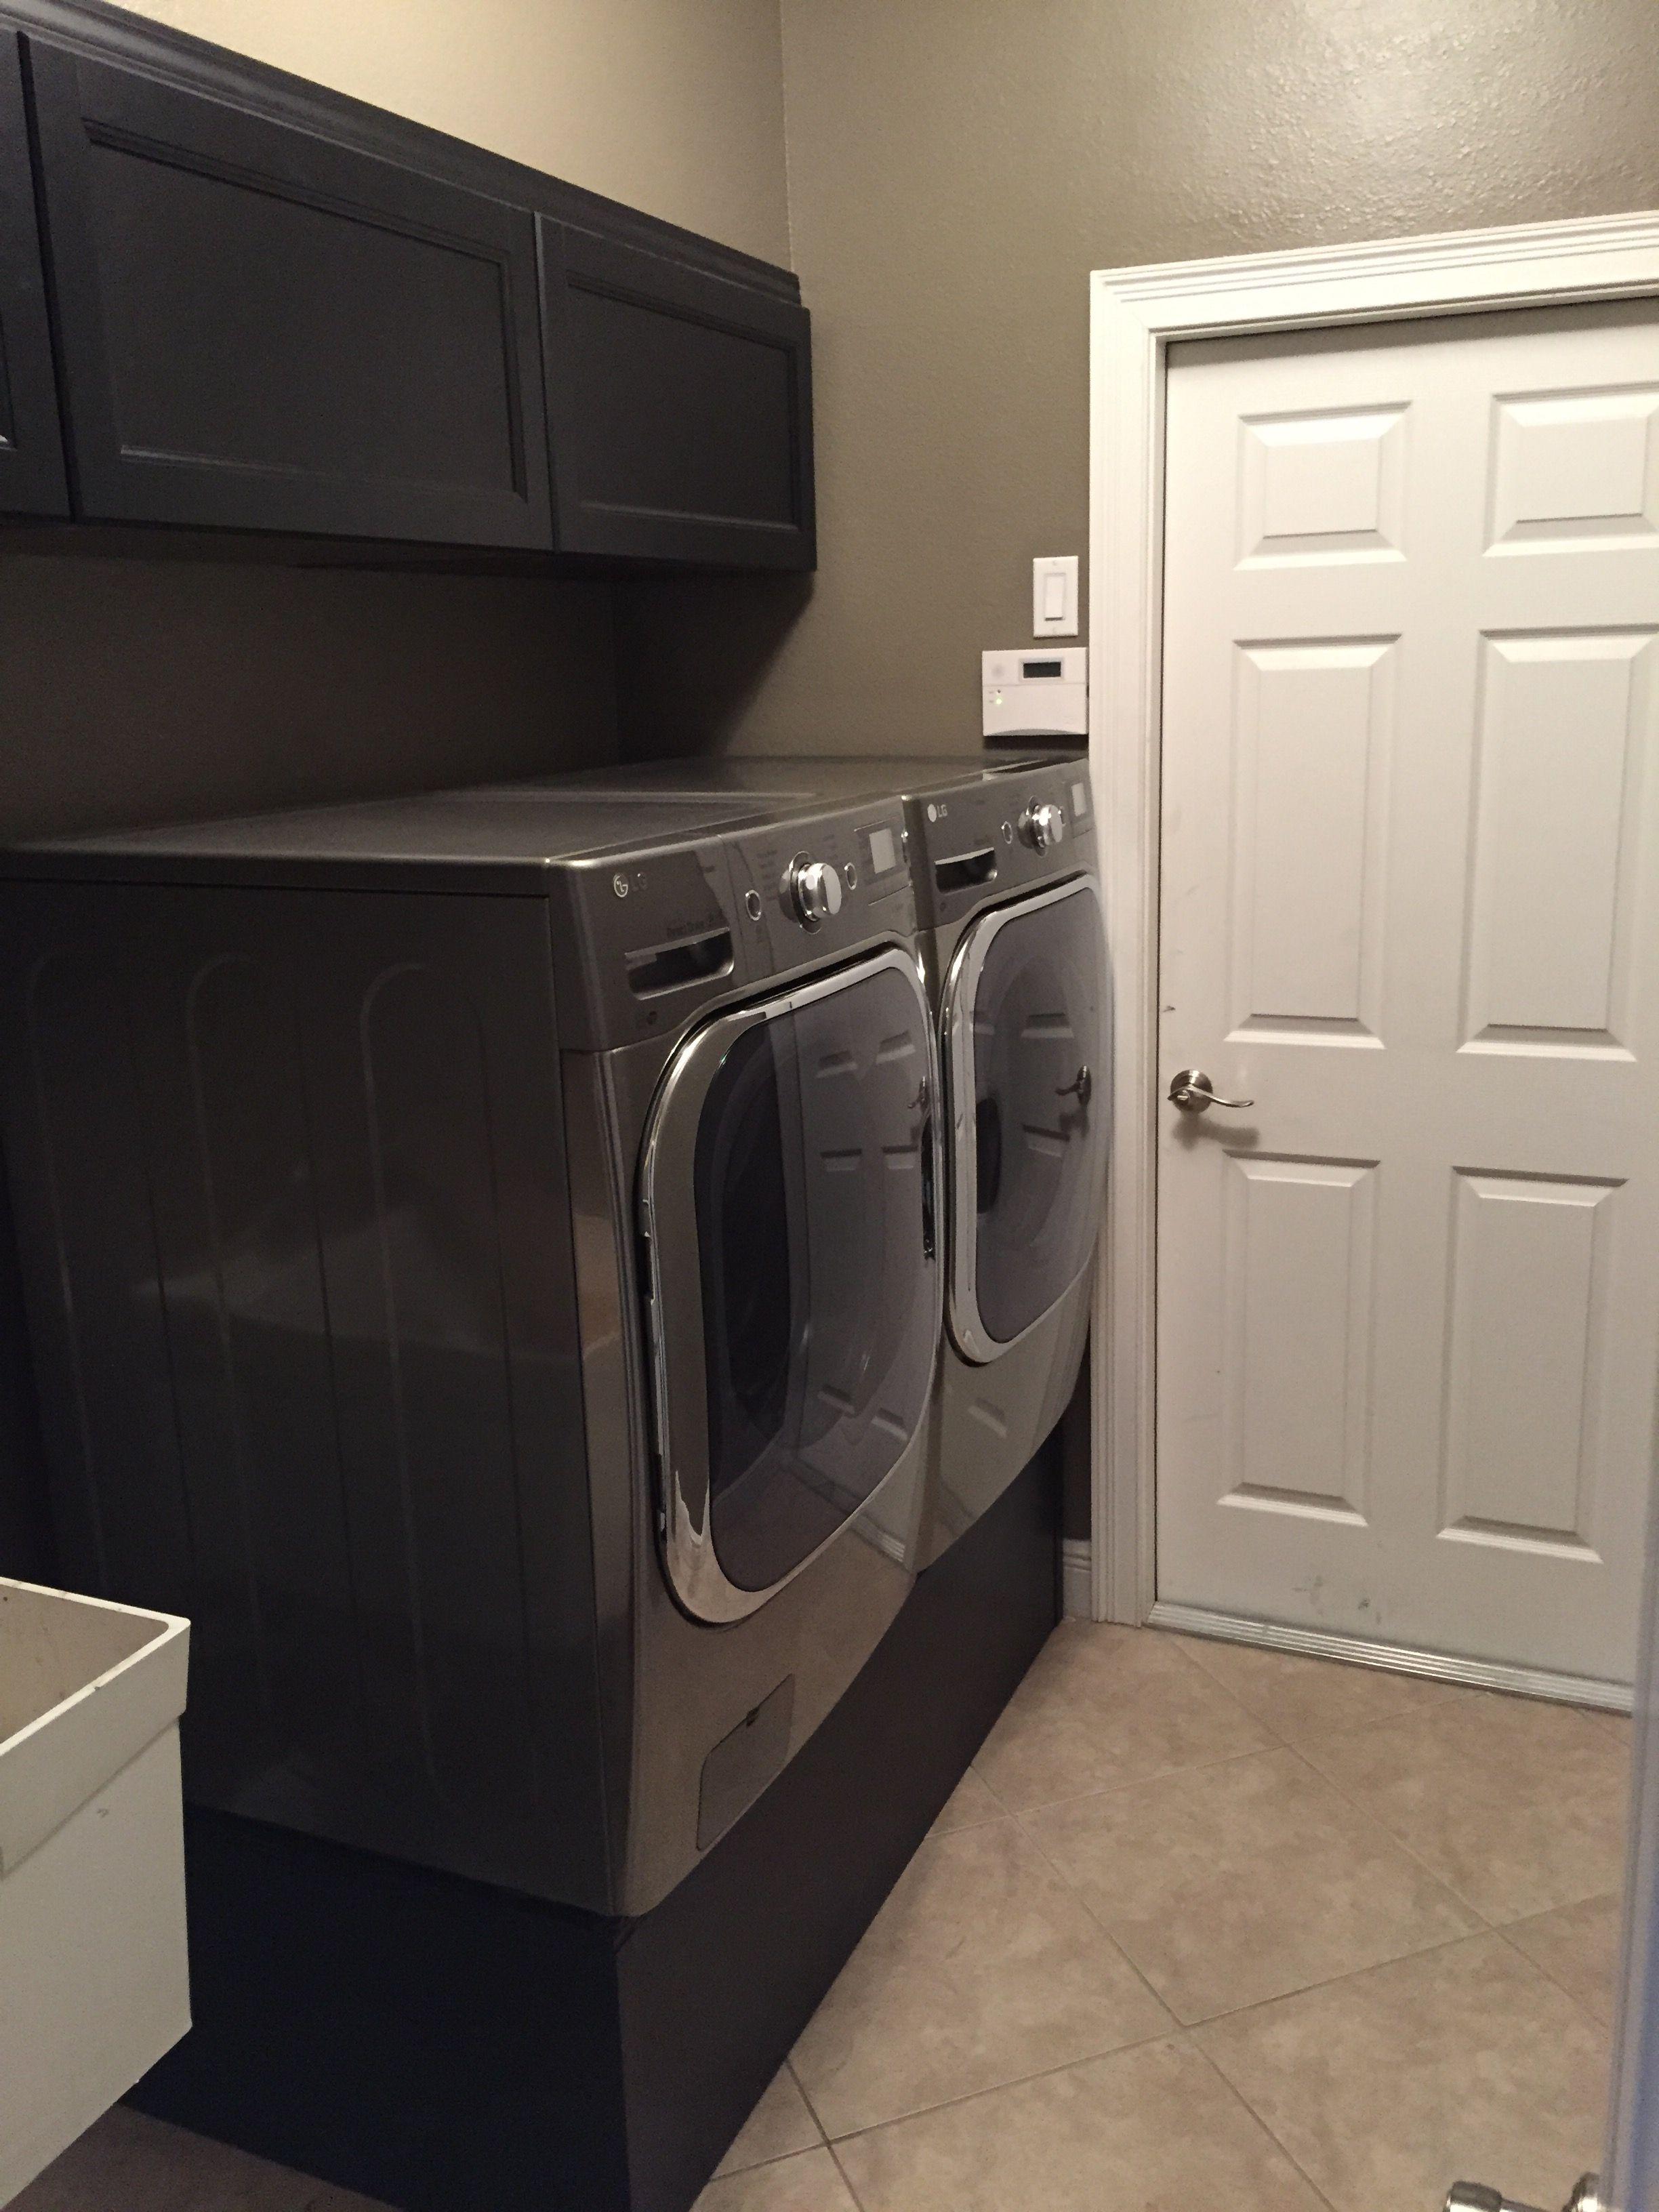 Turned Ikea Kallax Shelves Into A Washer Dryer Pedestal